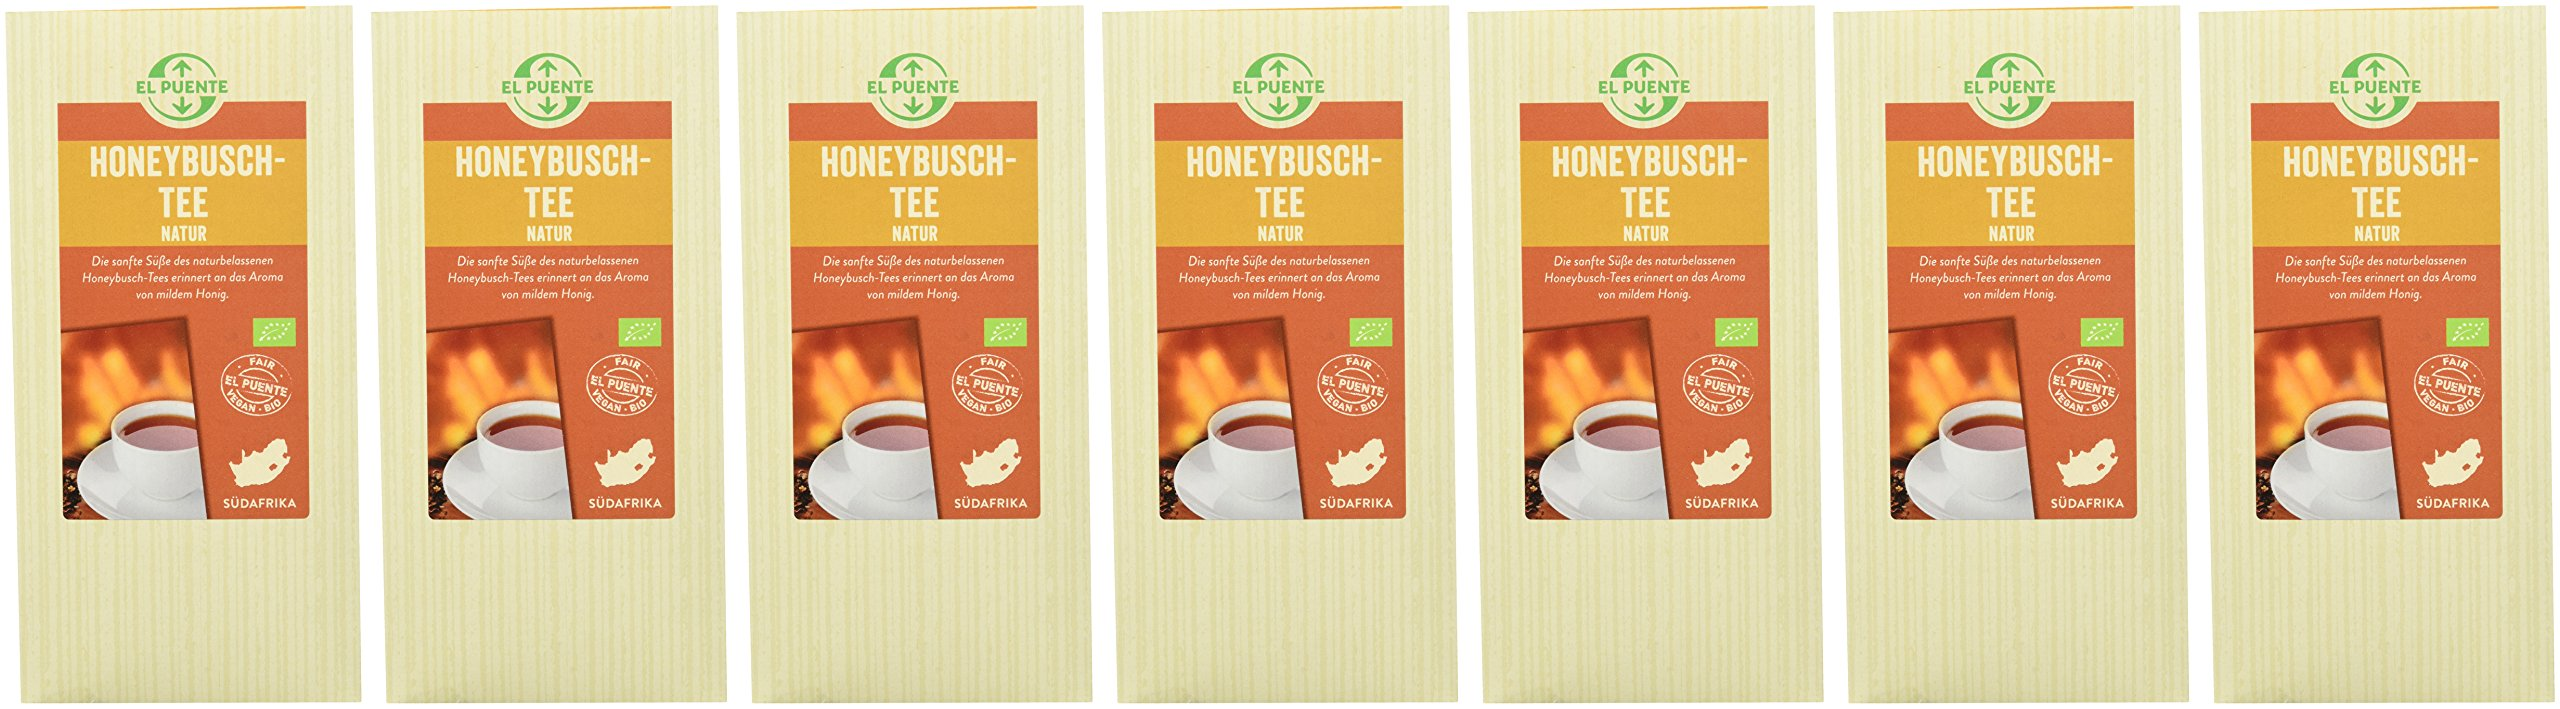 El-Puente-Honeybusch-Natur-7er-Pack-7-x-130-g